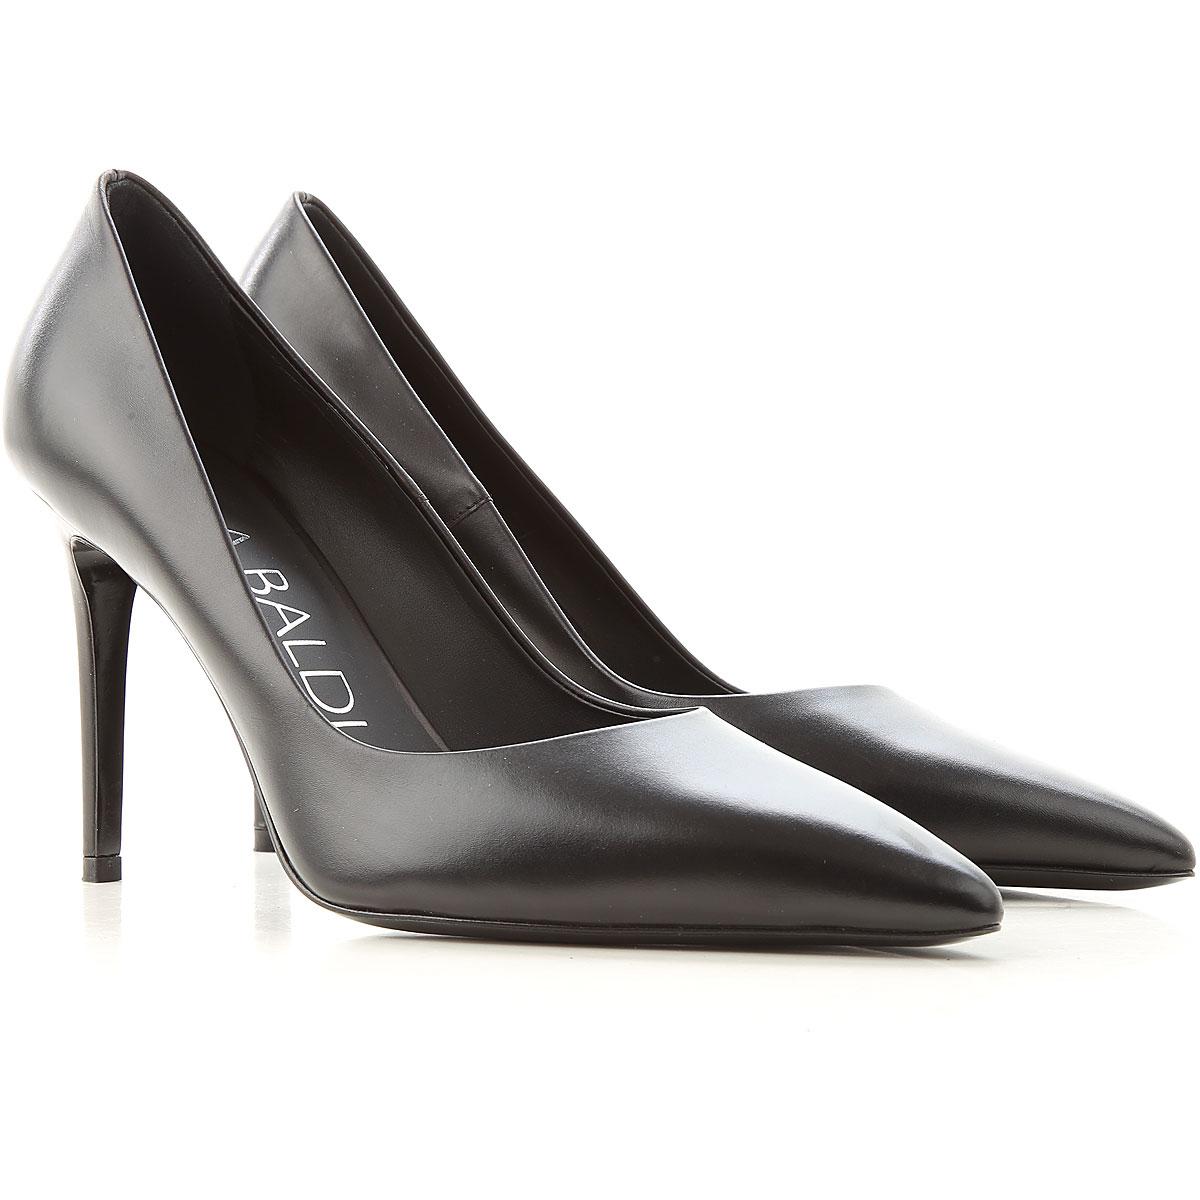 Lella Baldi Pumps & High Heels for Women On Sale, Black, Leather, 2019, 7 8 9